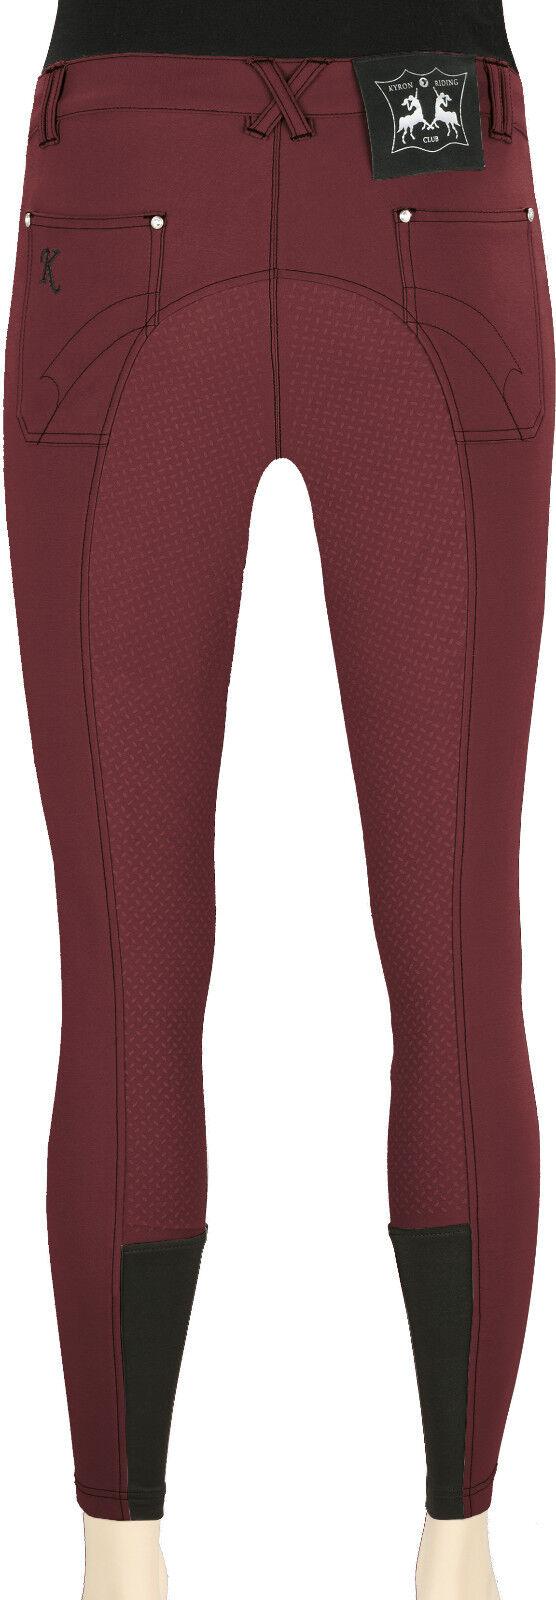 Kyron Ladies Jodhpurs Soft Grip, FULL TRIM, Berry Size  34-84  hot sales